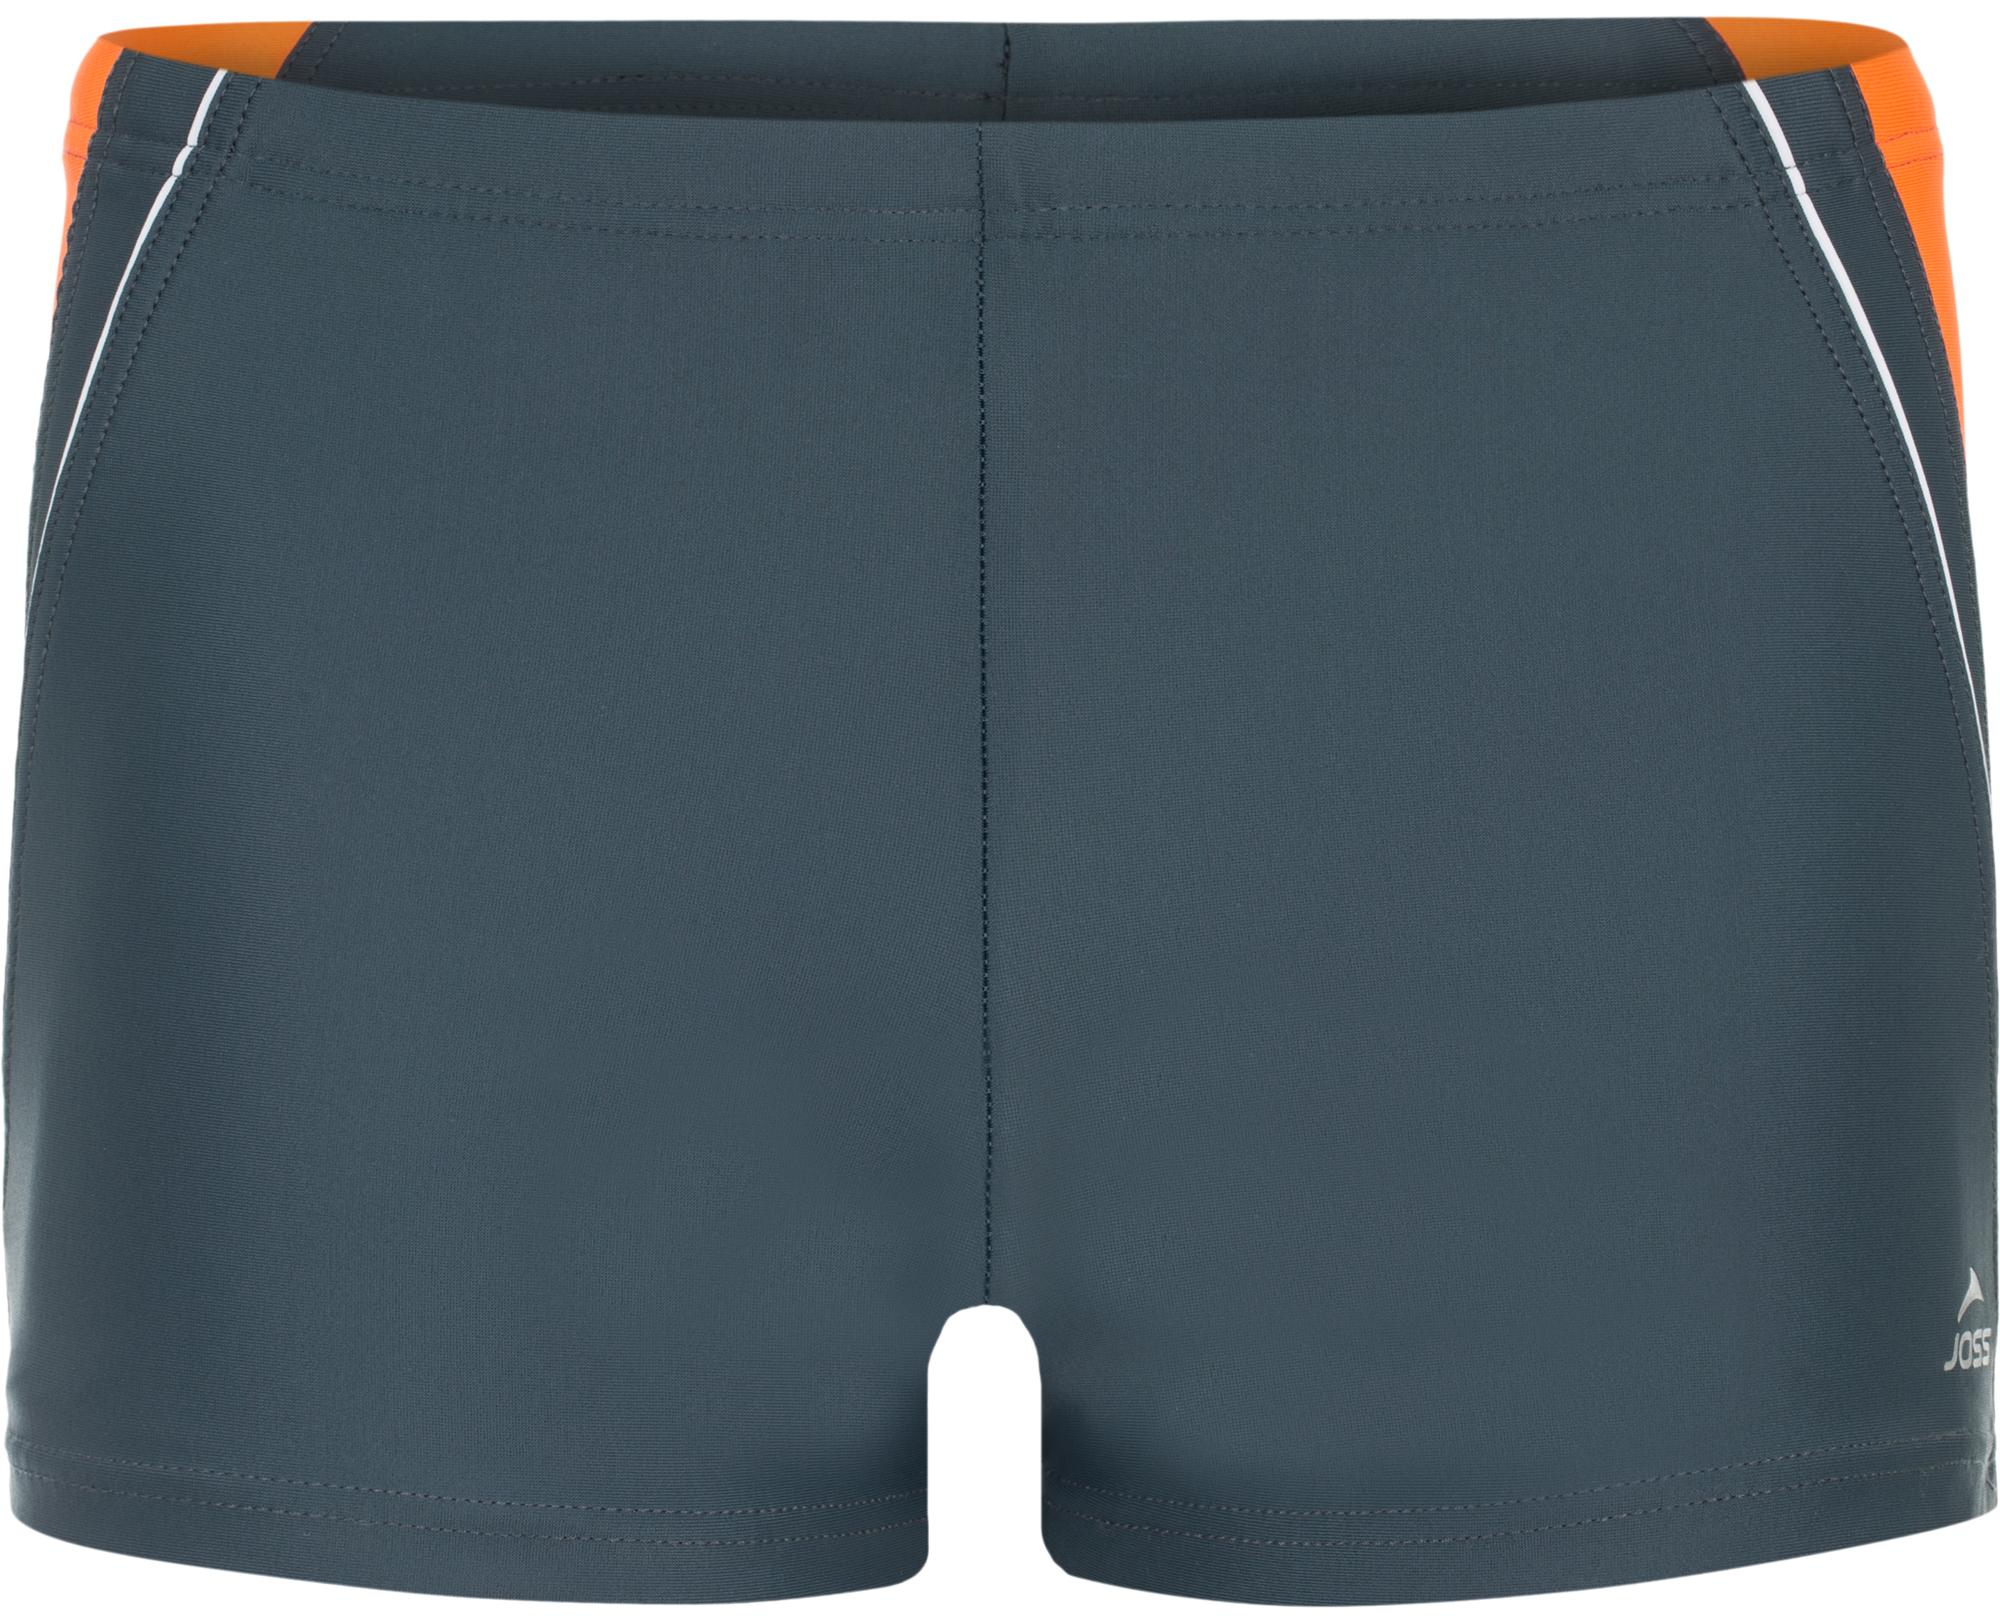 Joss Плавки-шорты для мальчиков Joss